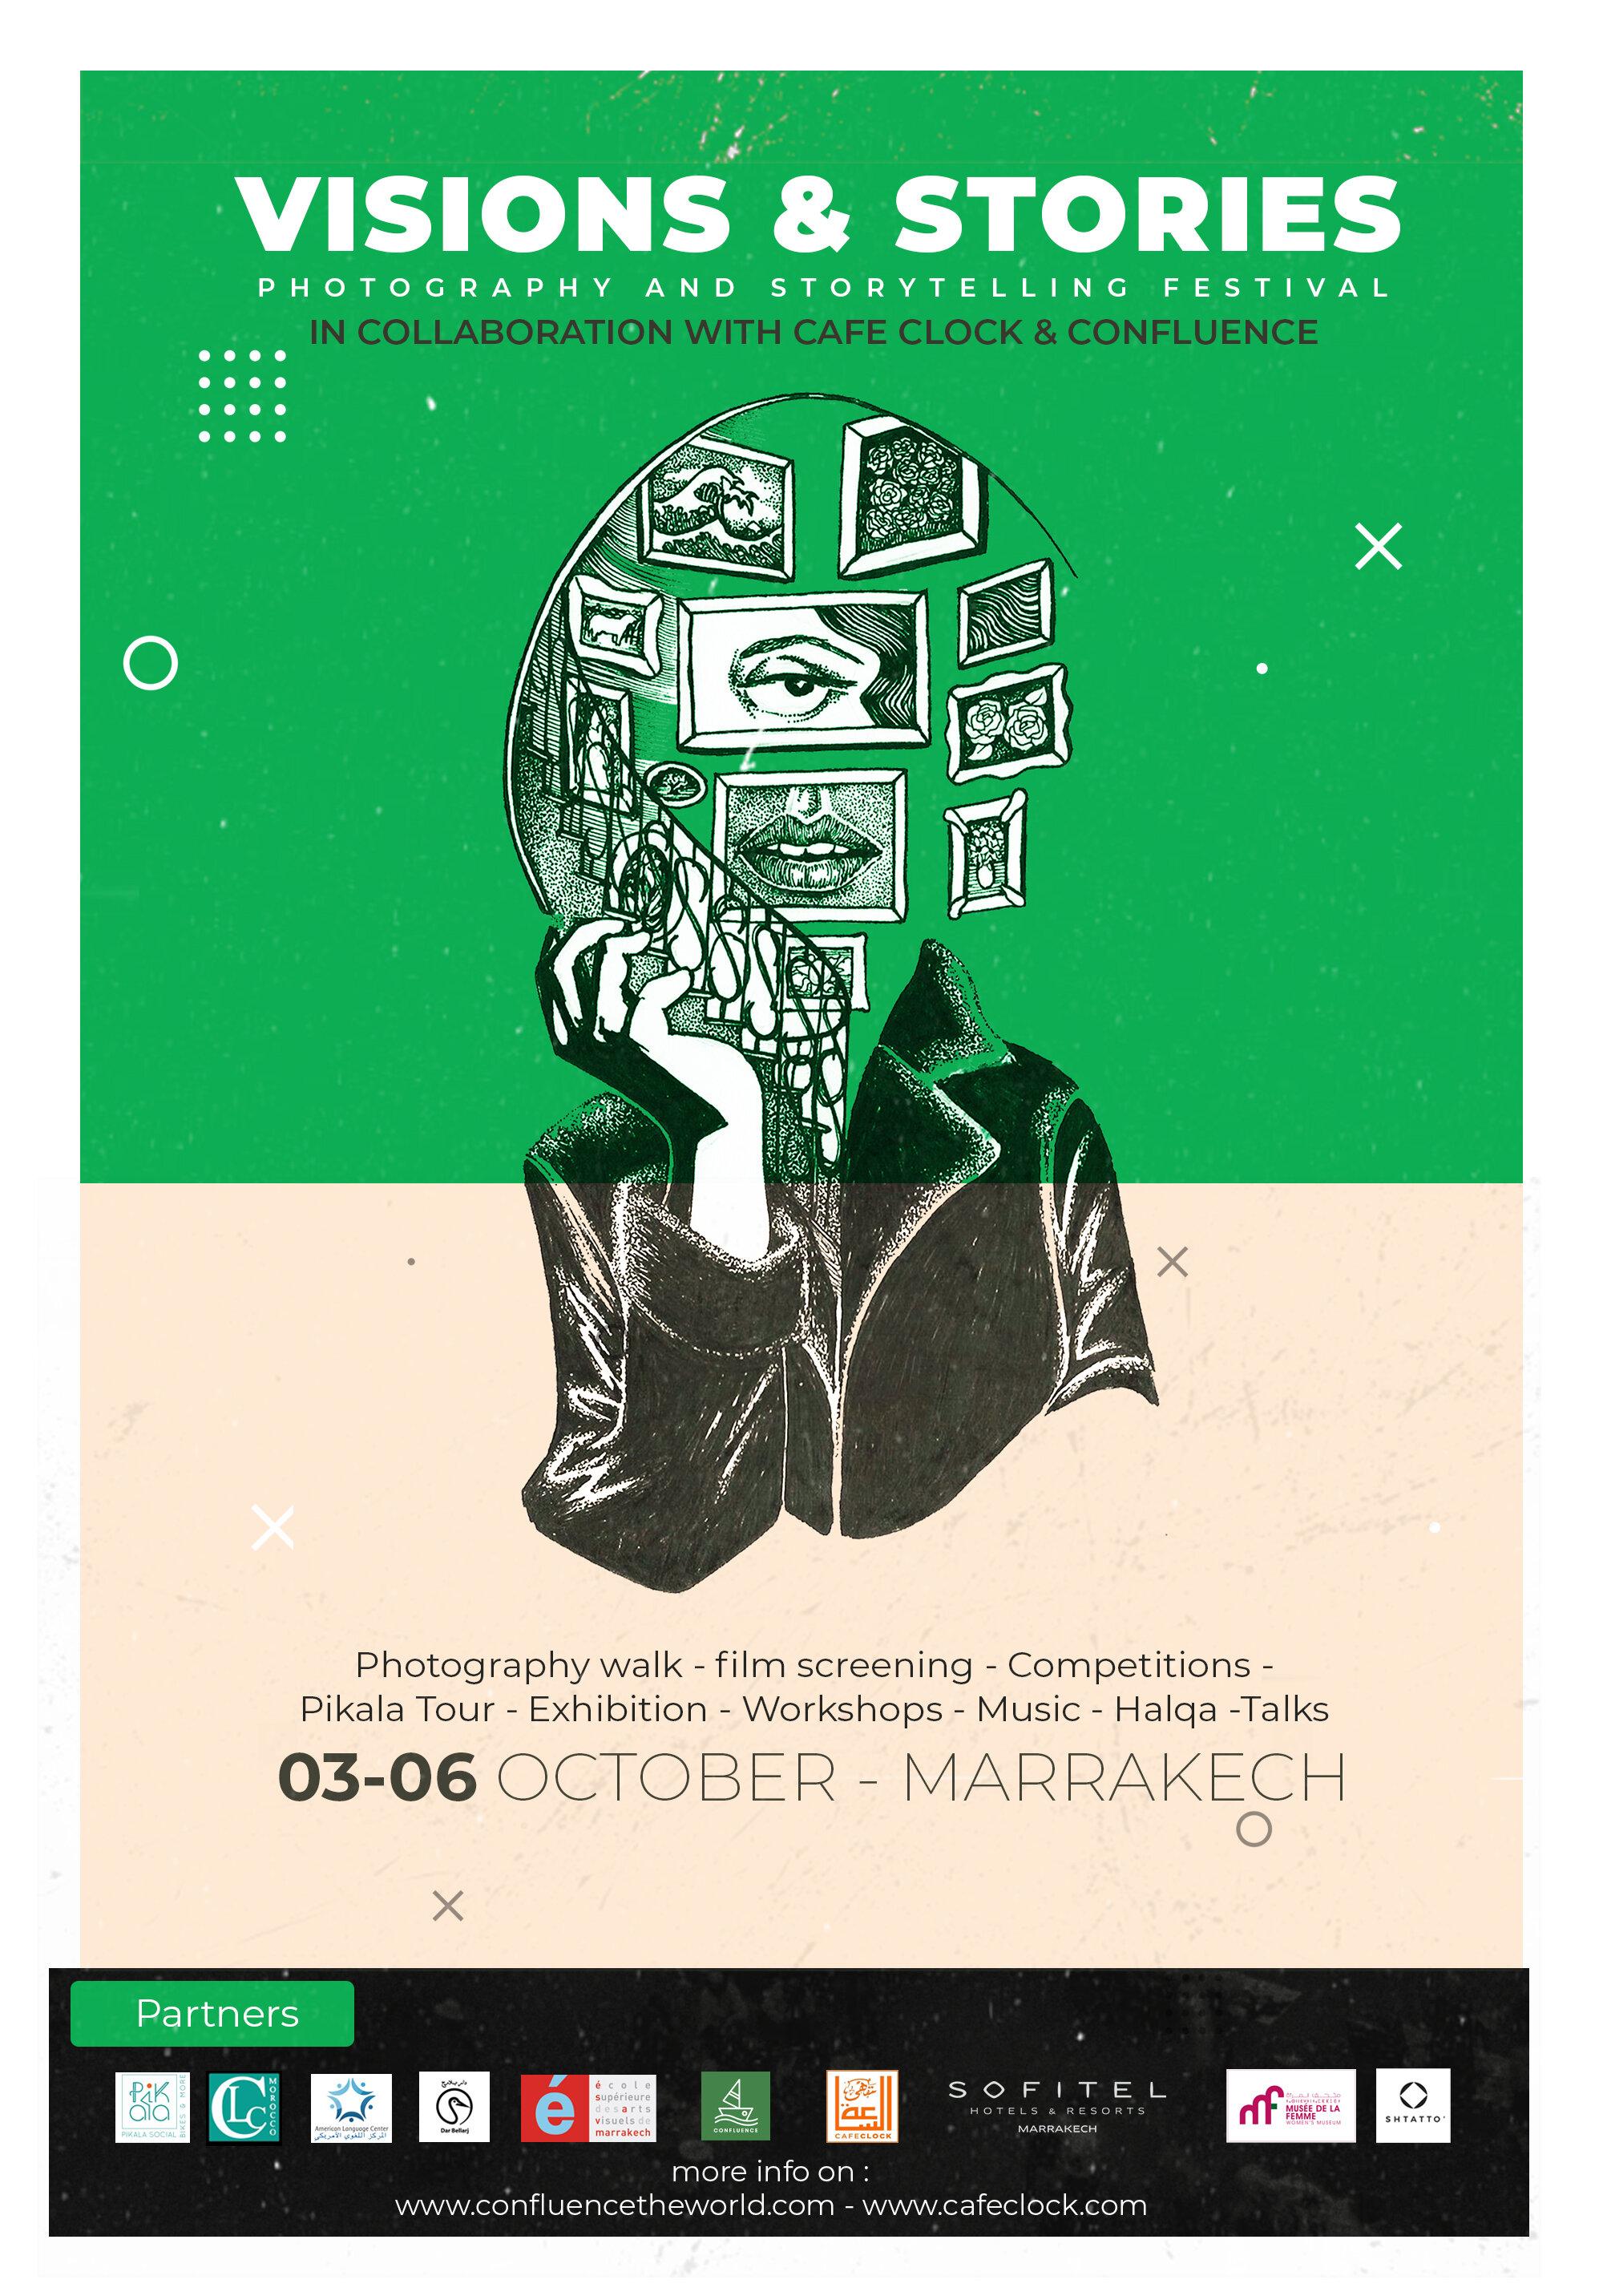 confluence festival visions stories 2019 marrakech.jpg